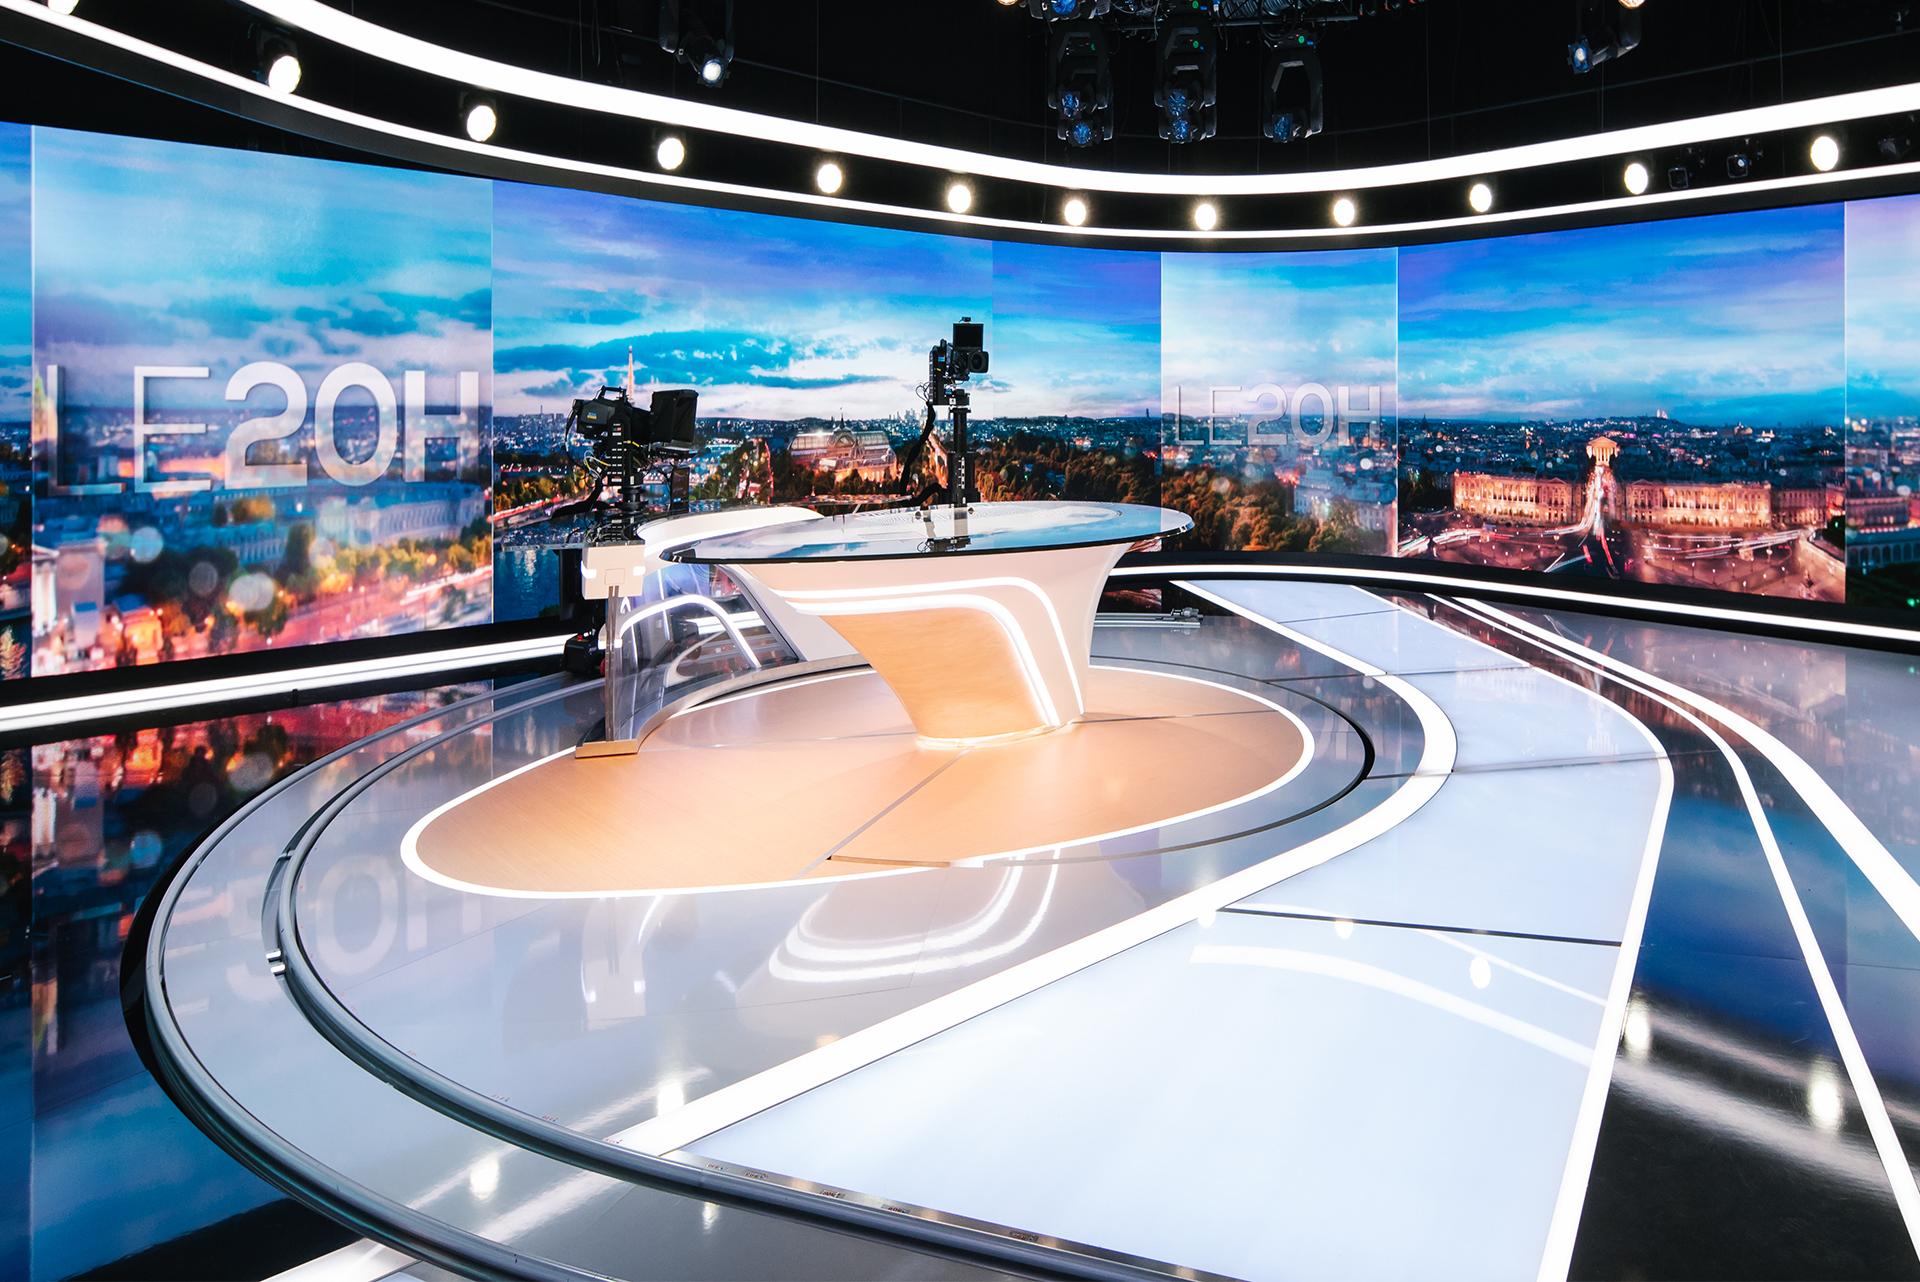 TF1 News Studio Image